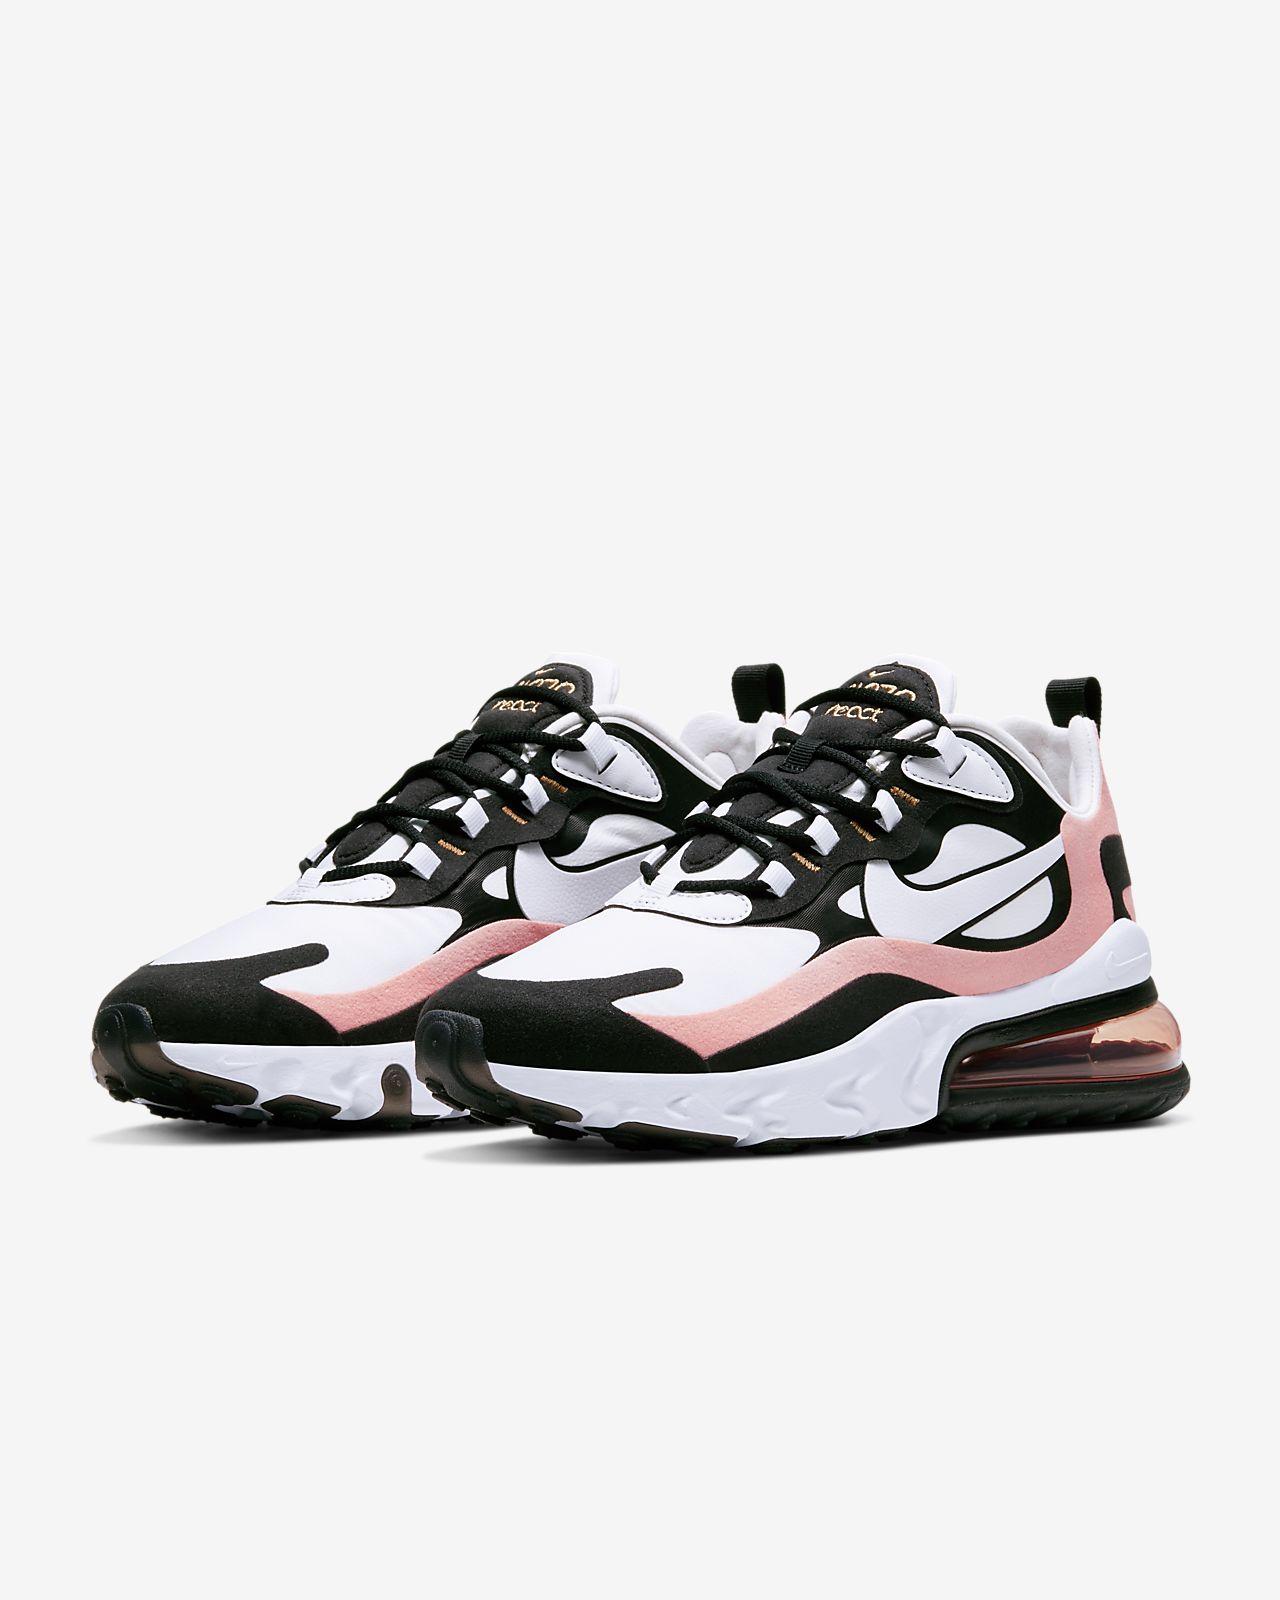 Nike Air Max 270 React sko til kvinder